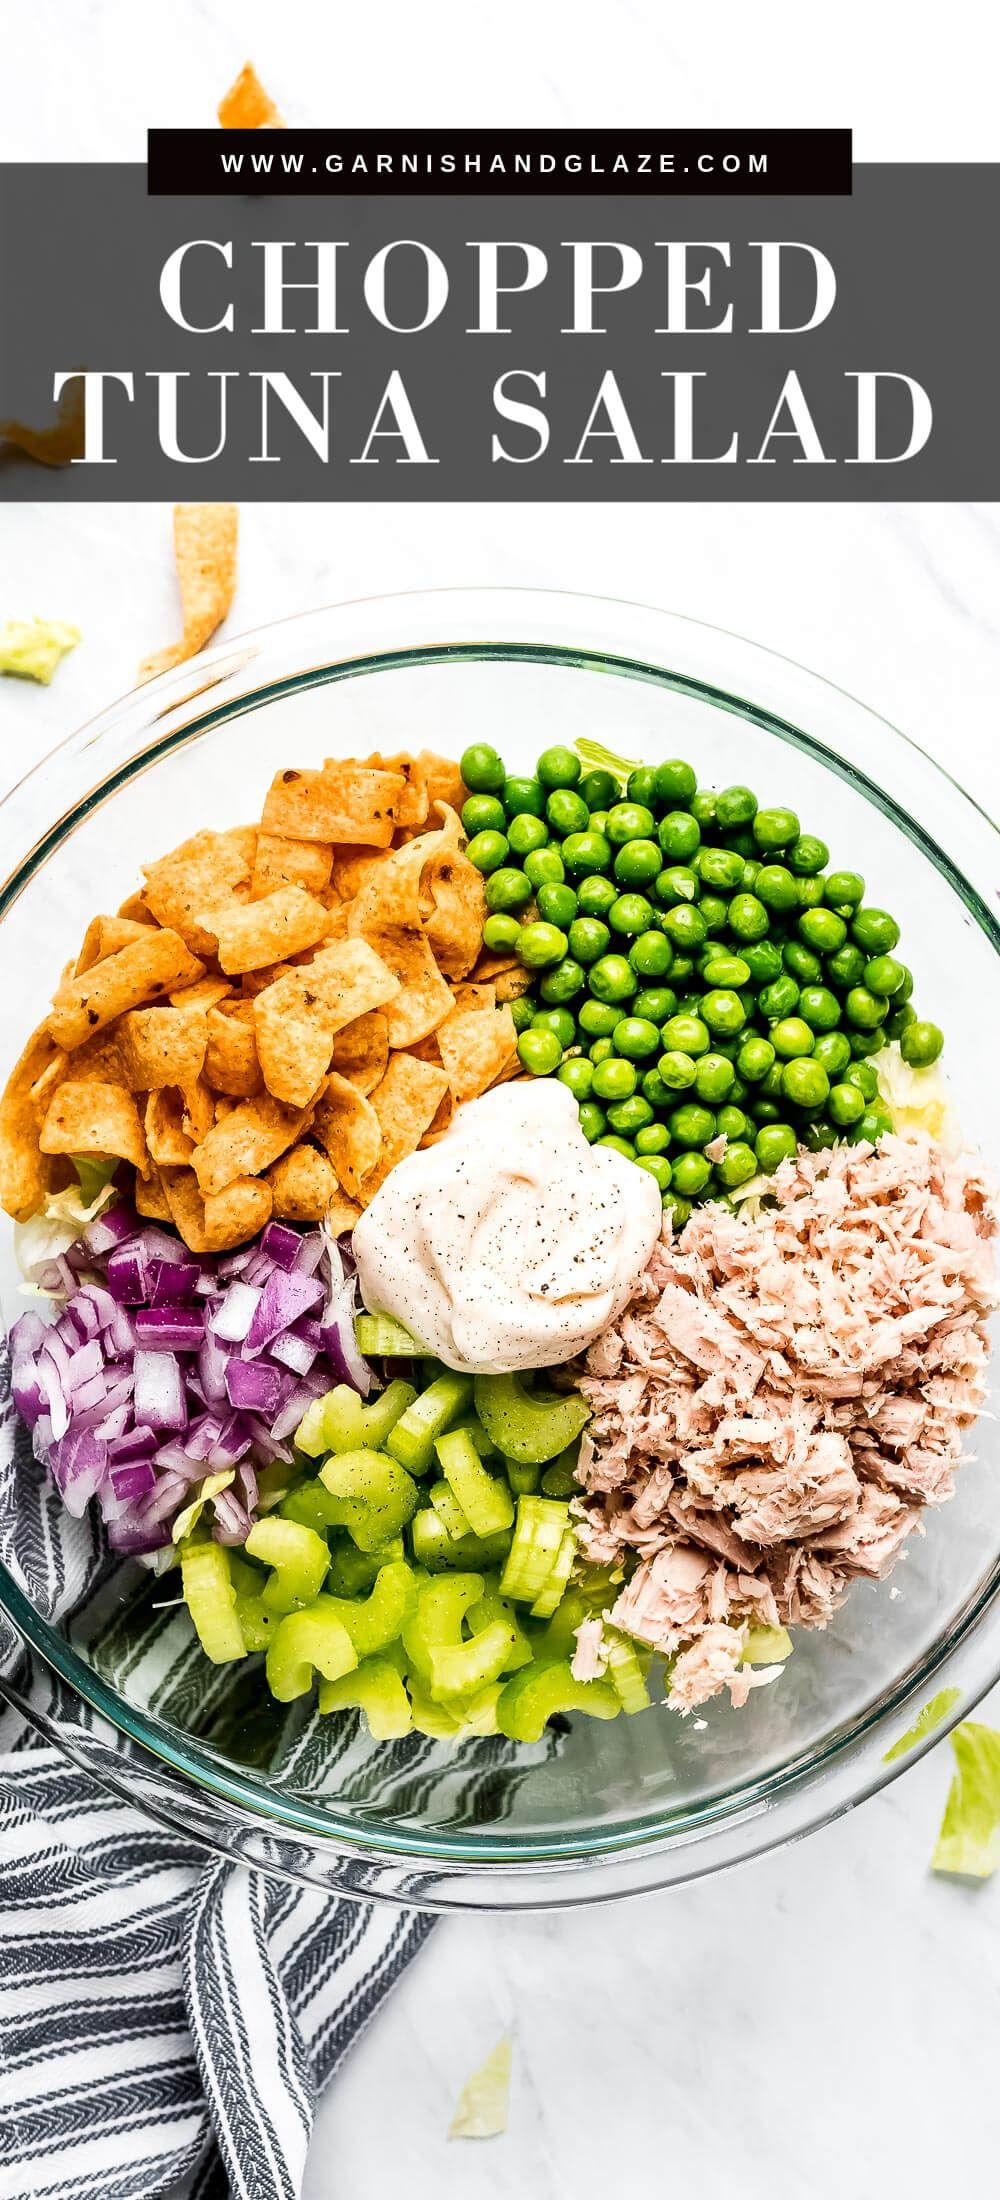 Tuna Salad Recipe With Veggies